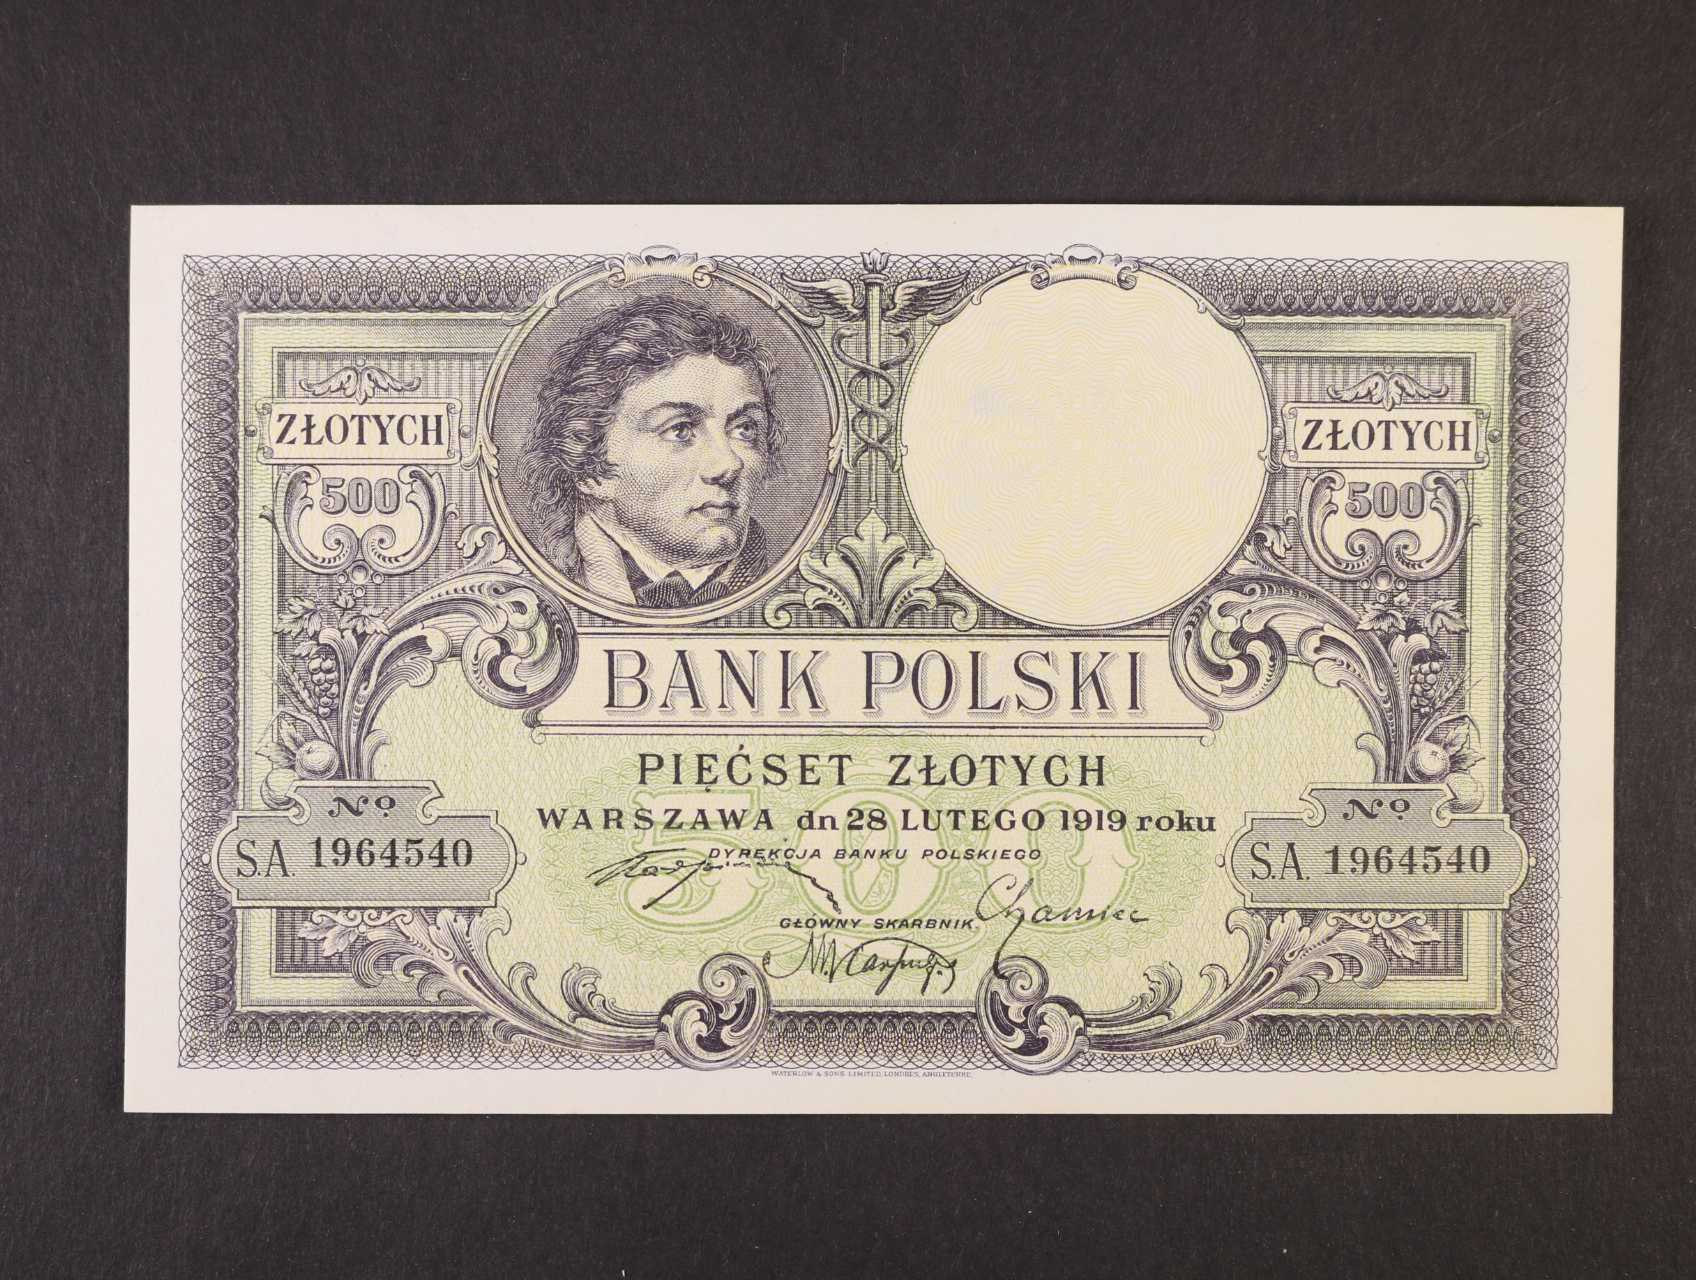 500 Zlotych 28.2.1919 série A, platná na ČS území, Pi. 58, Ba. PL 13